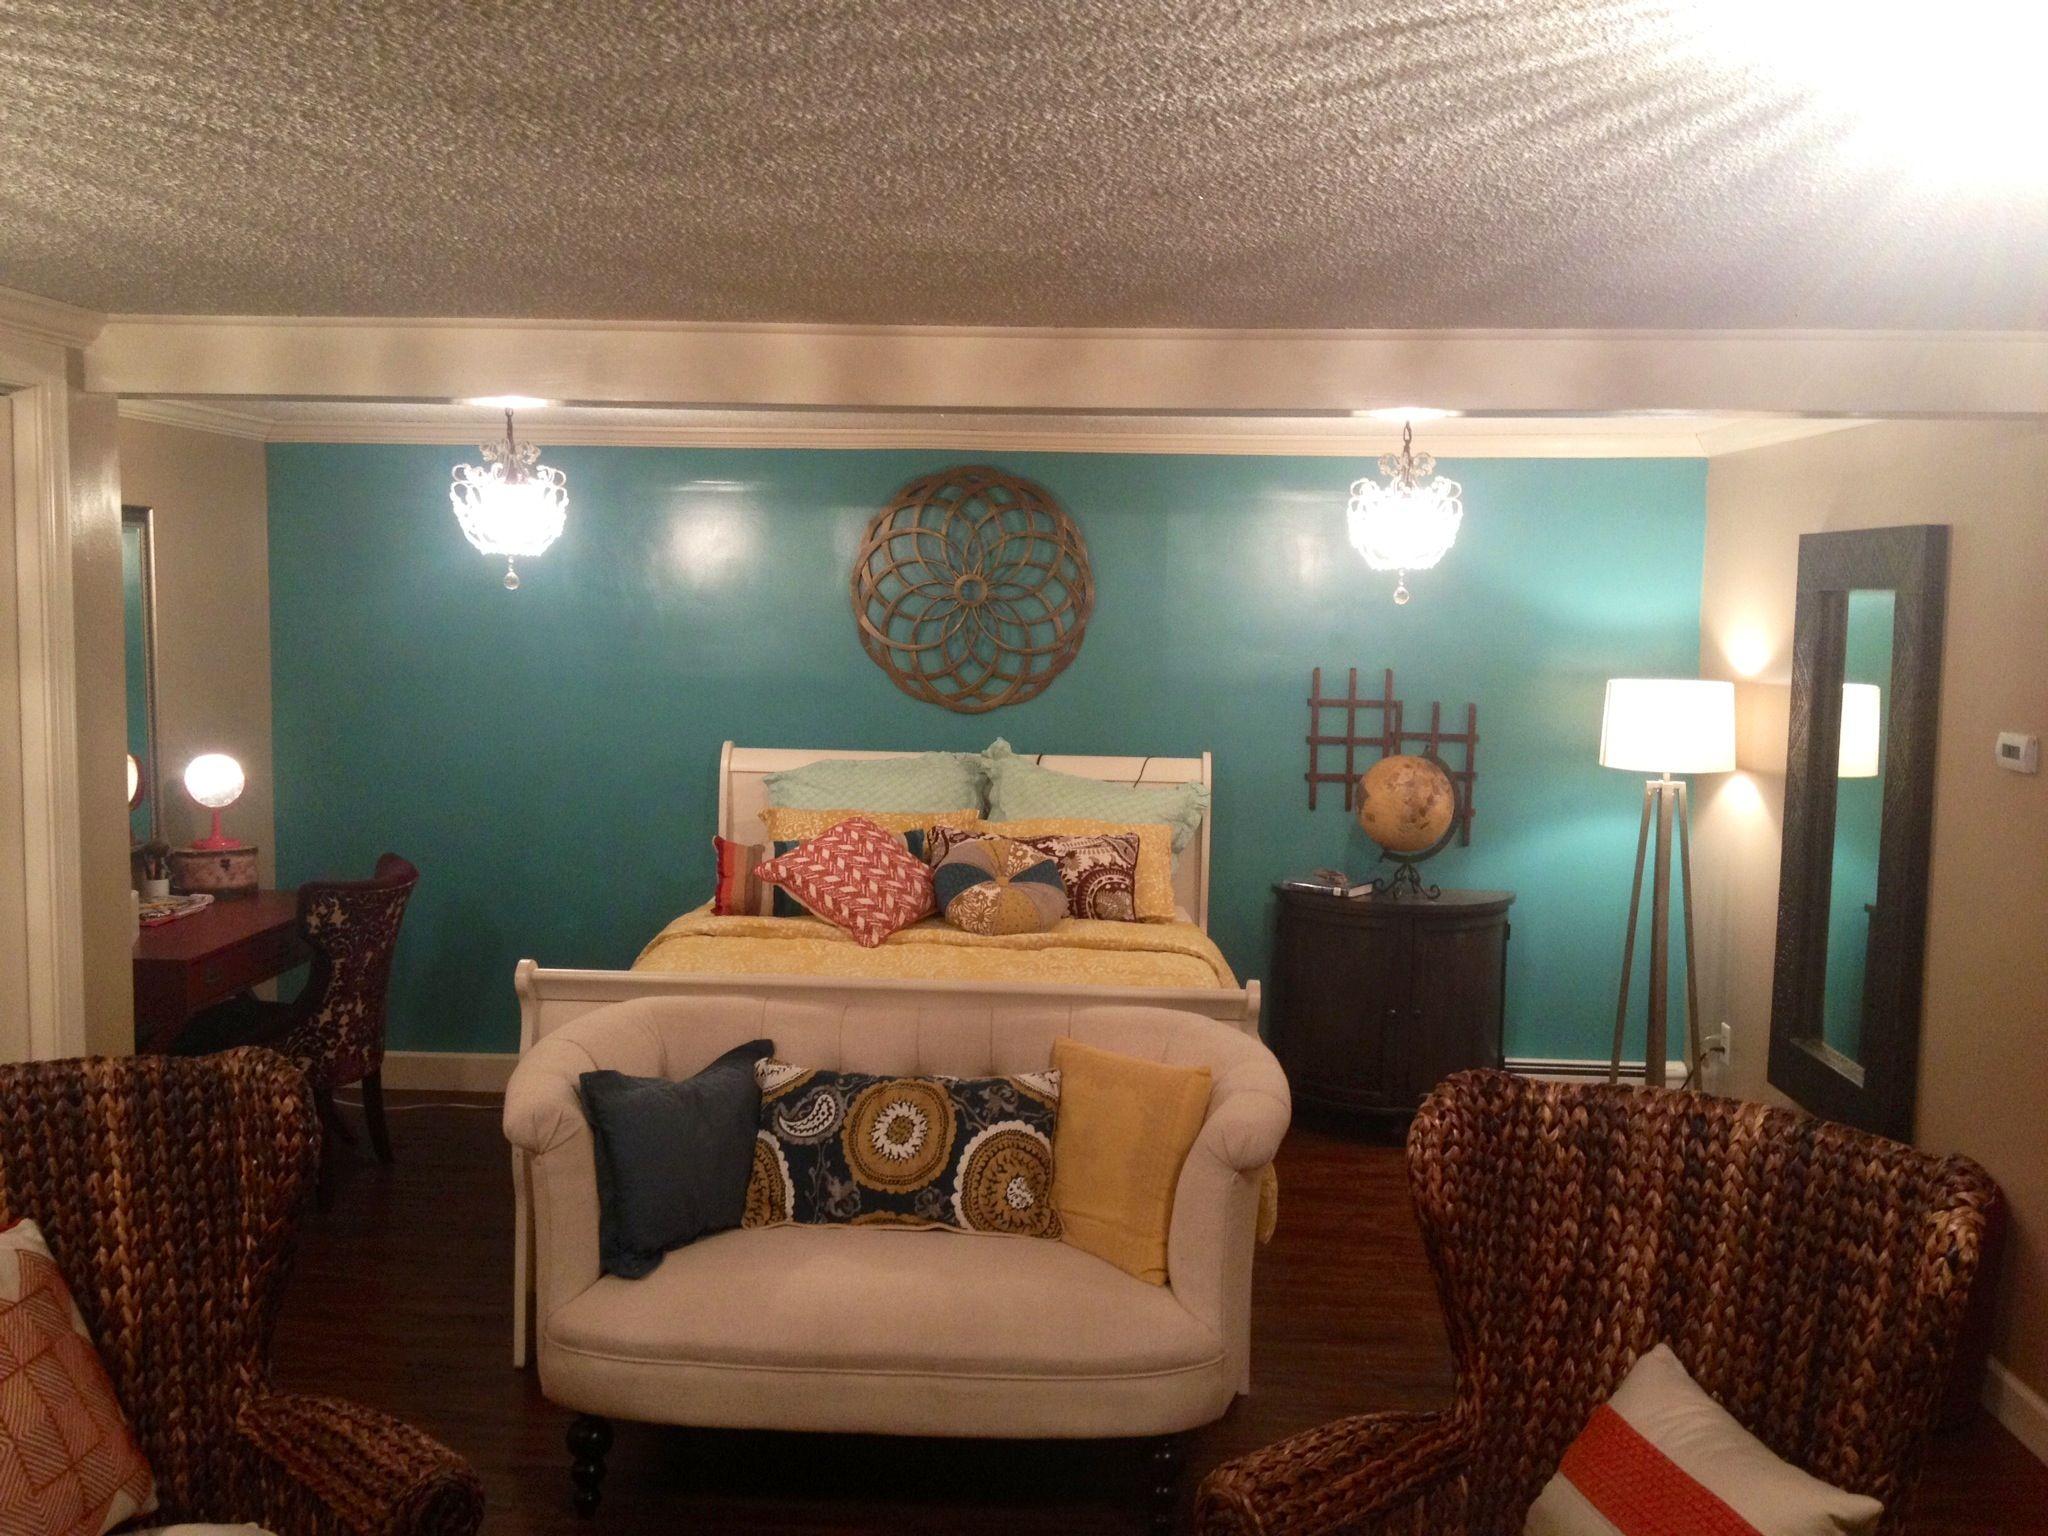 basement teen bedroom ideas. Basement Teen Room Bedroom Ideas